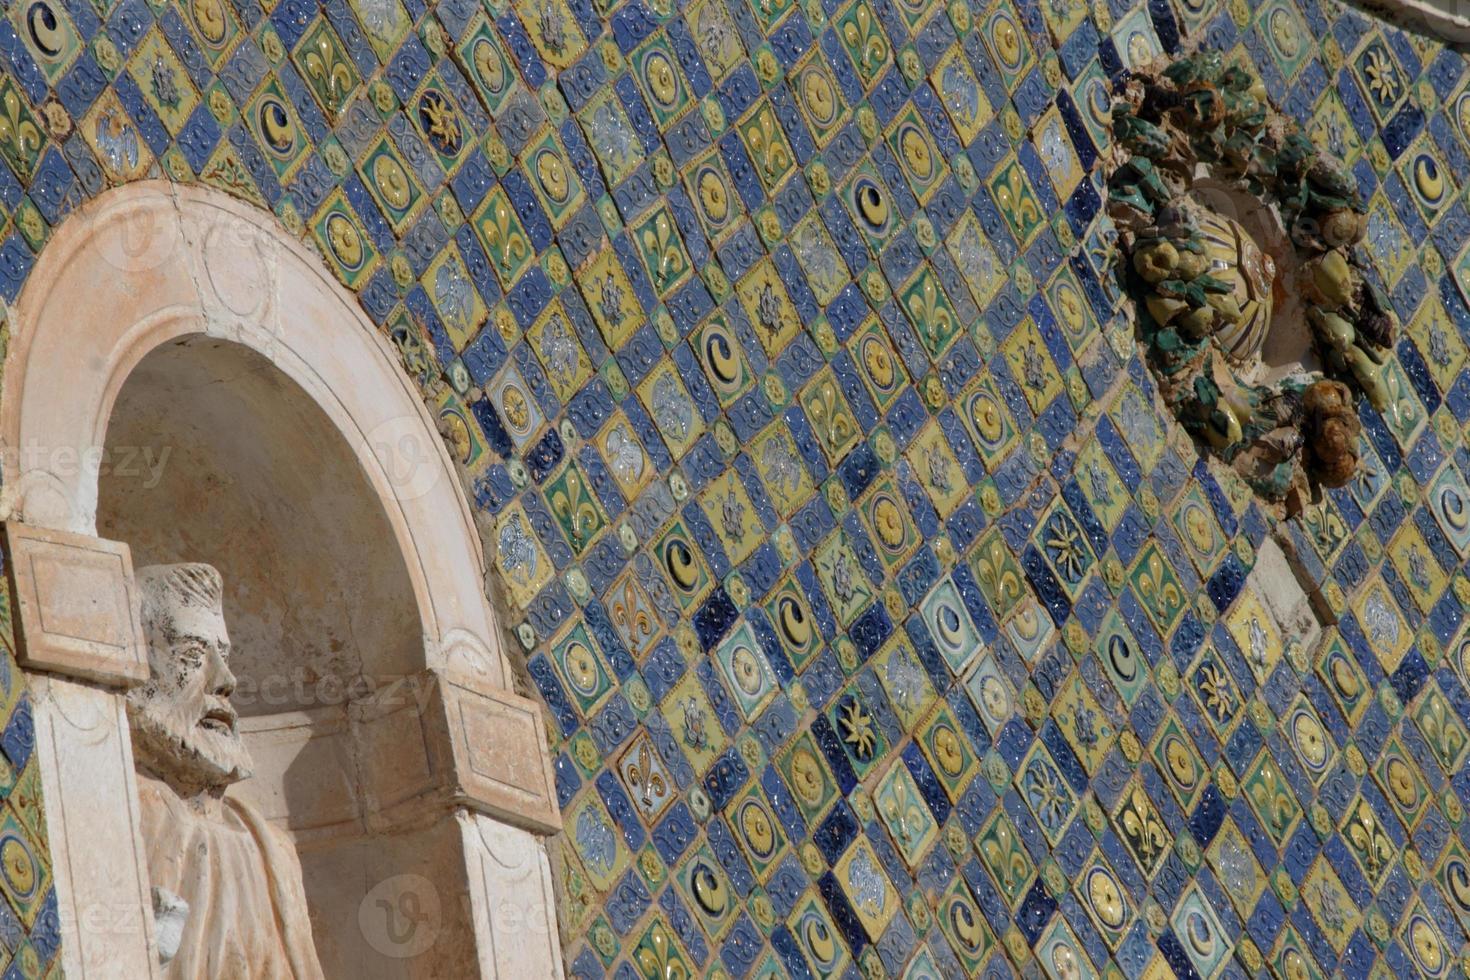 Carreaux de majolique sur la façade de Santa Maria delle Grazie photo